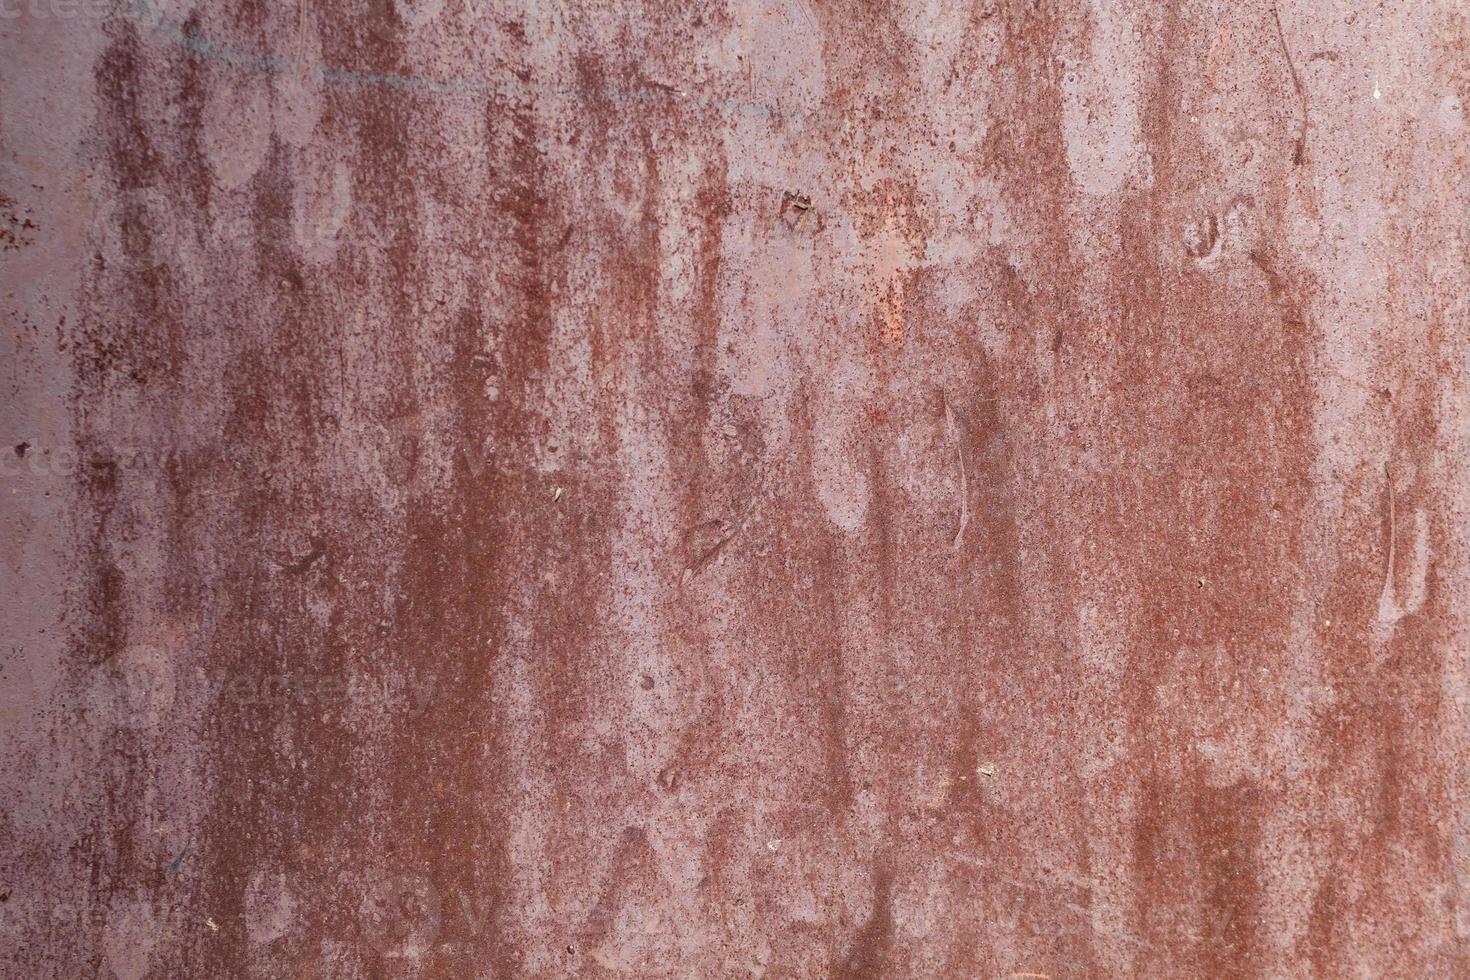 rostig målad metall konsistens foto